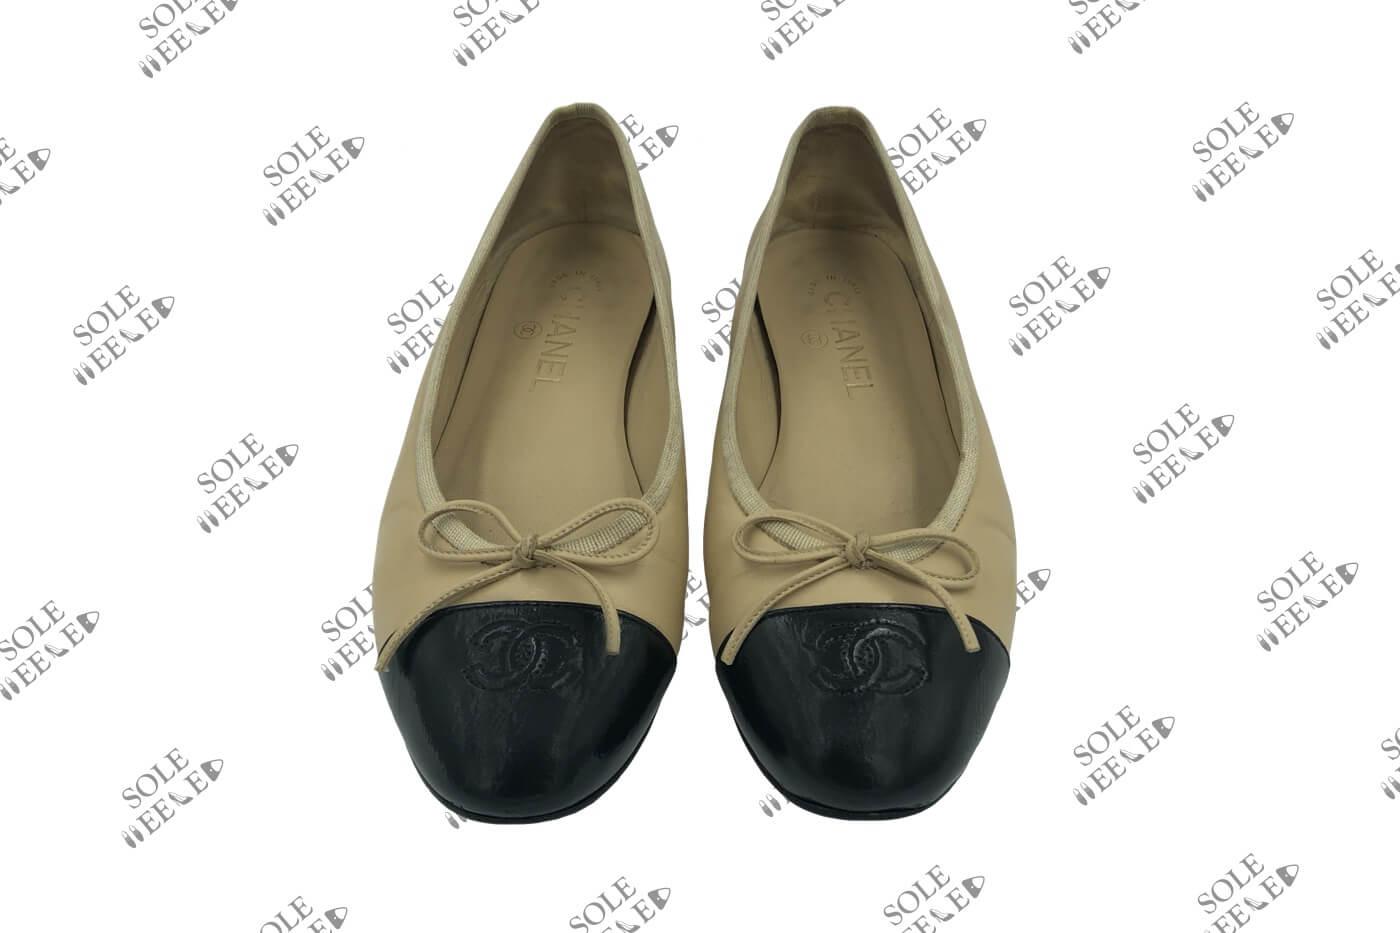 Chanel Shoe Restoration